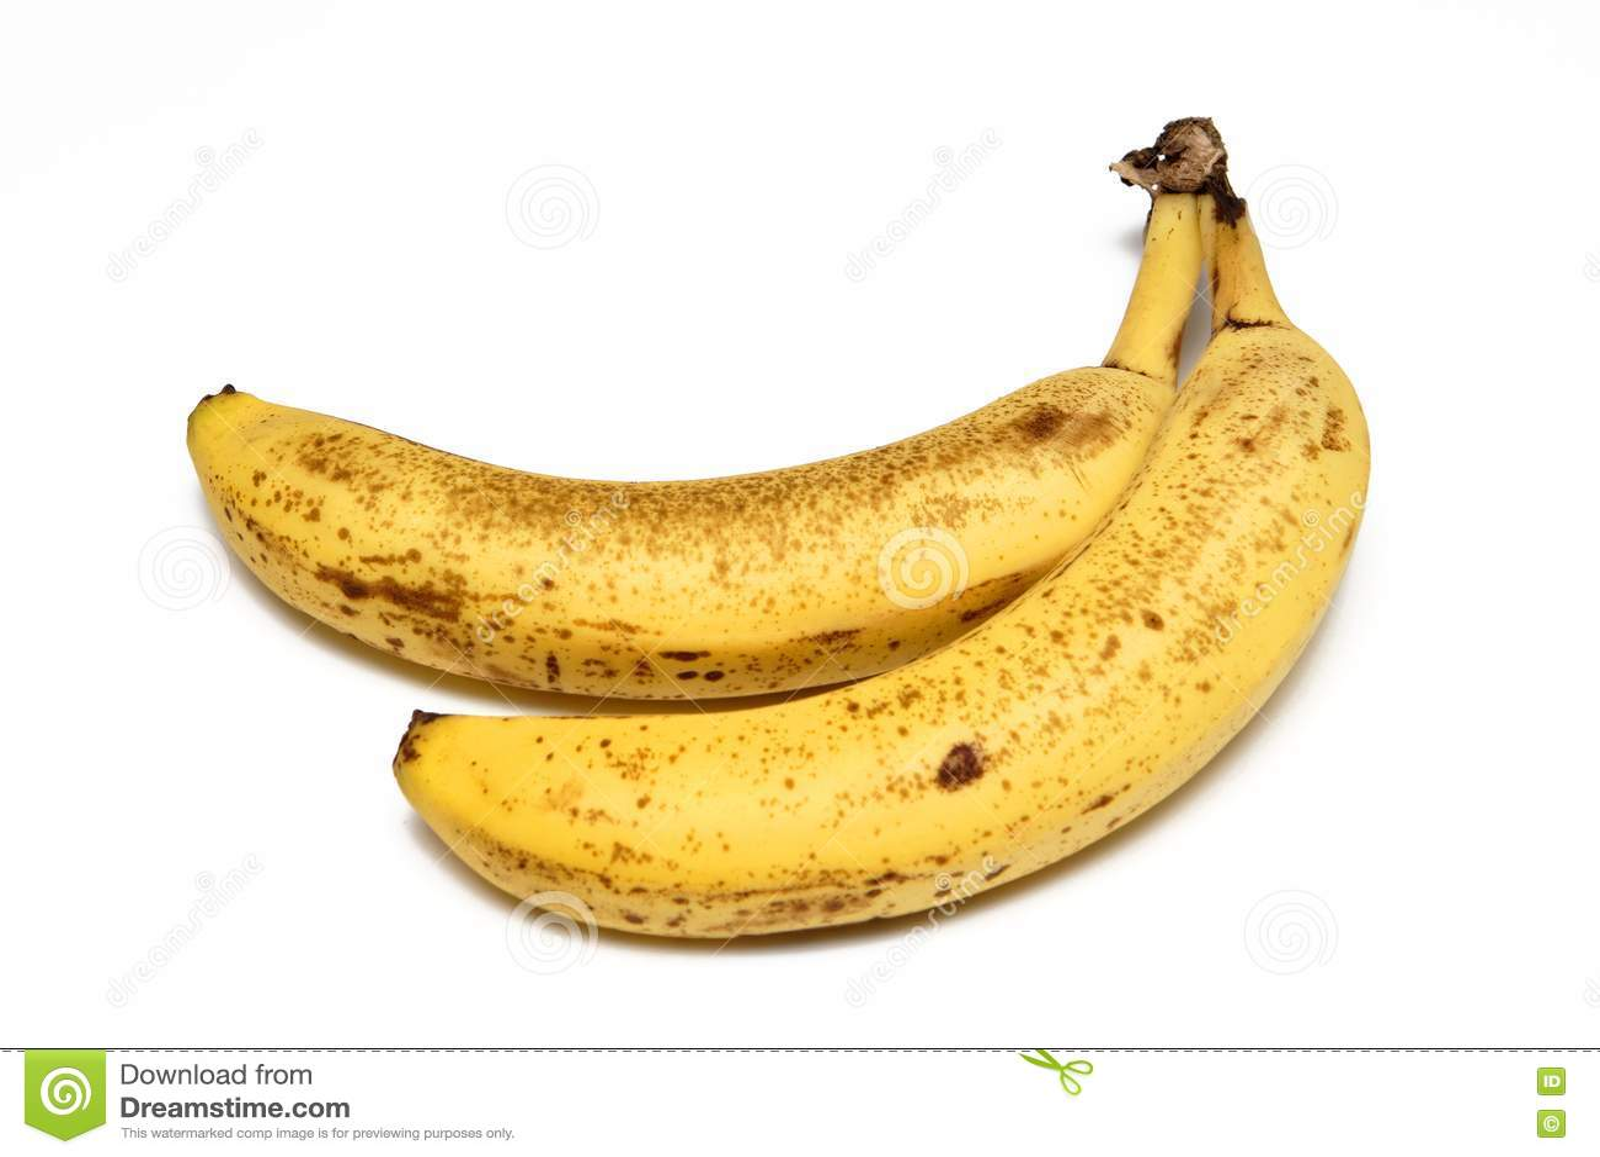 Bananas Stock Photos - Image: 398393